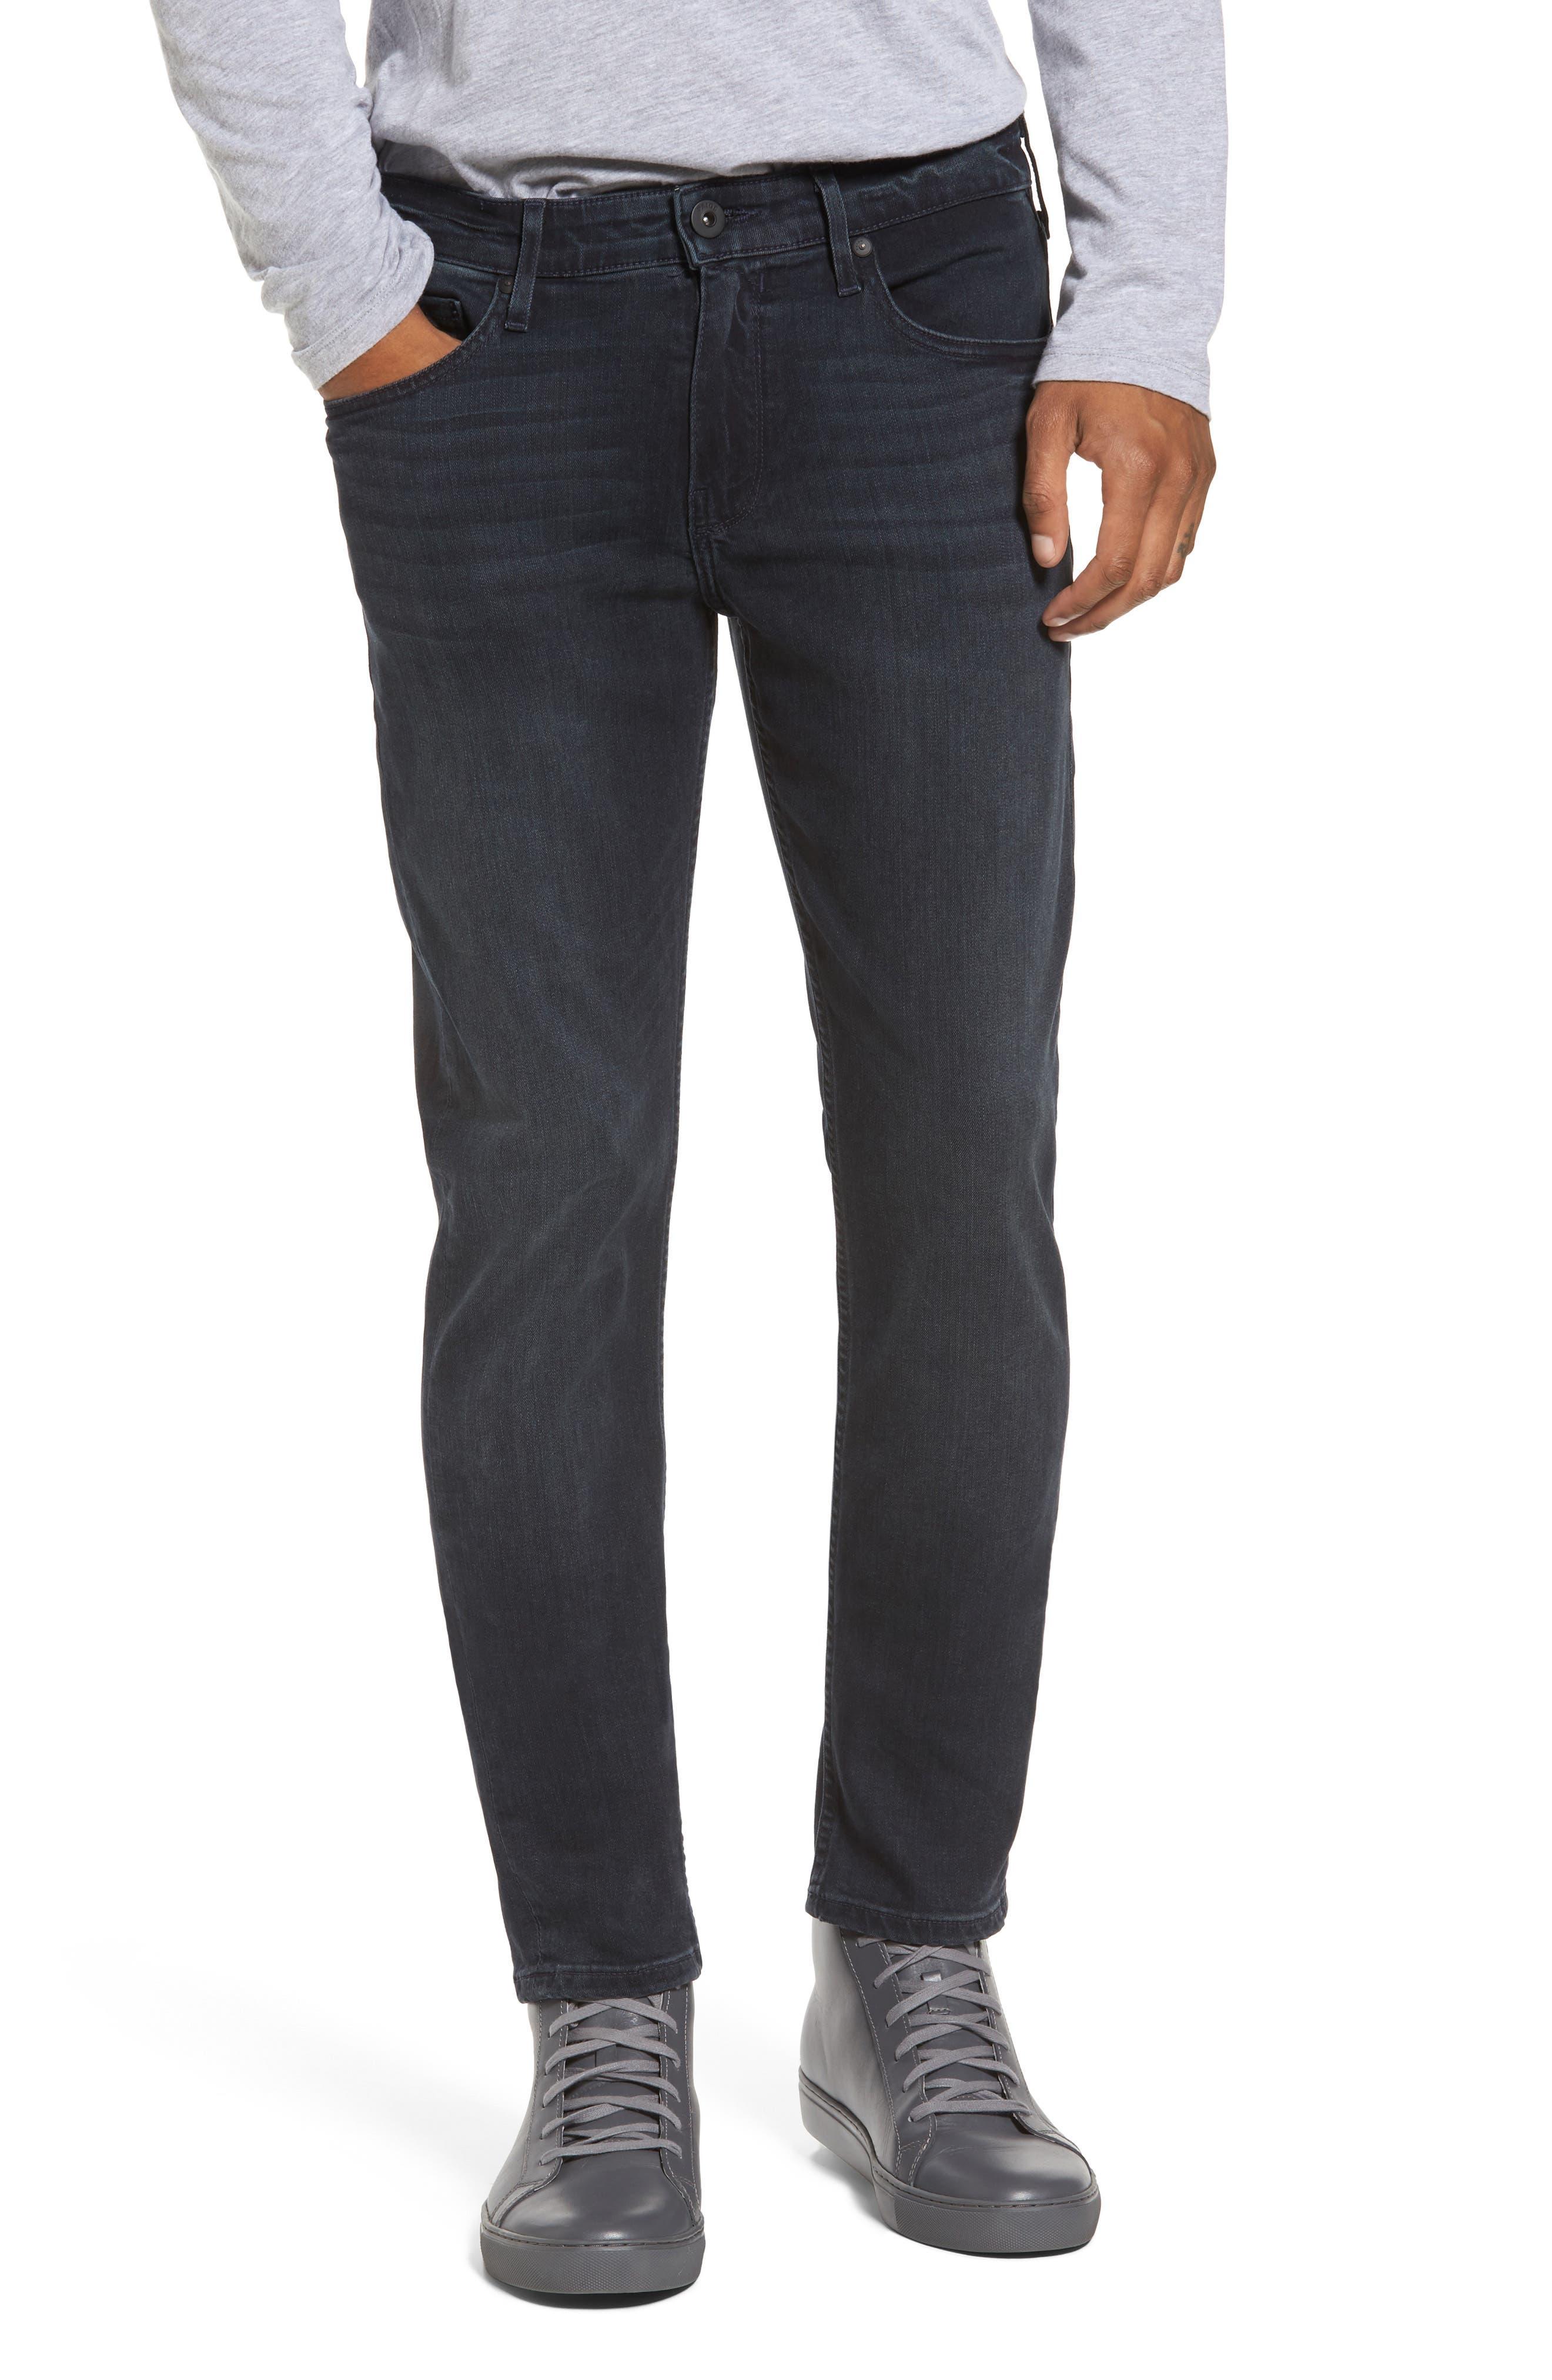 Transcend - Croft Skinny Fit Jeans,                             Main thumbnail 1, color,                             Beckett